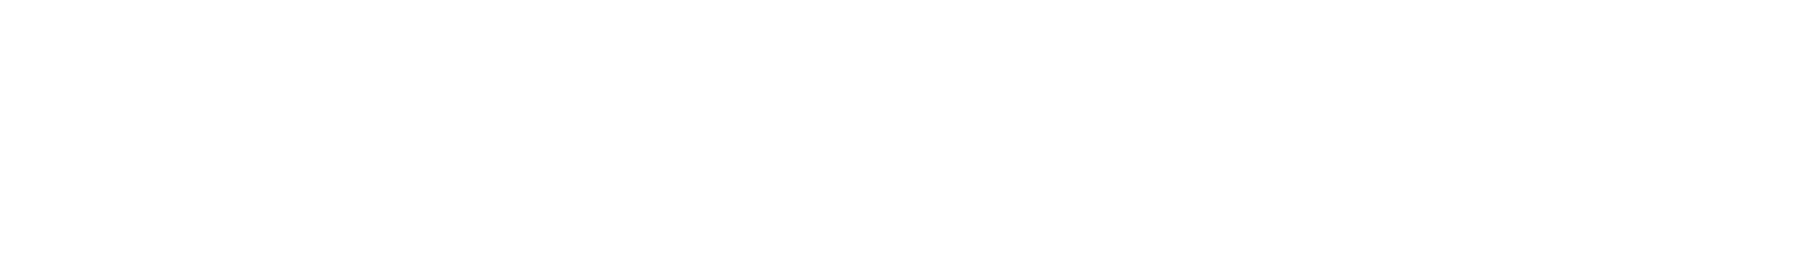 slow beatboxing